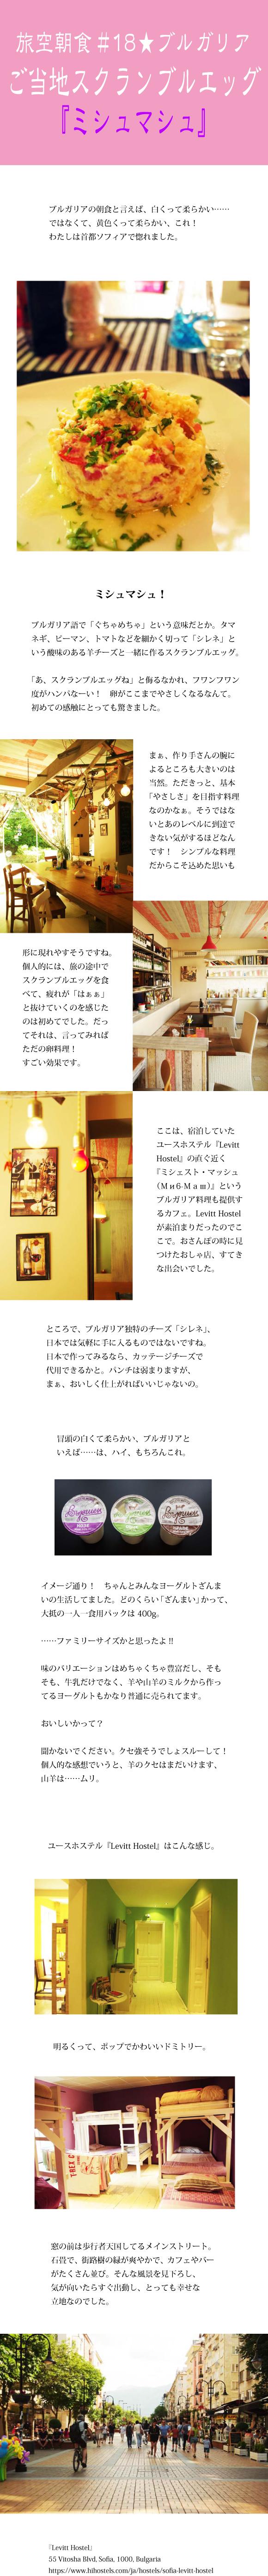 tomako170405.jpg